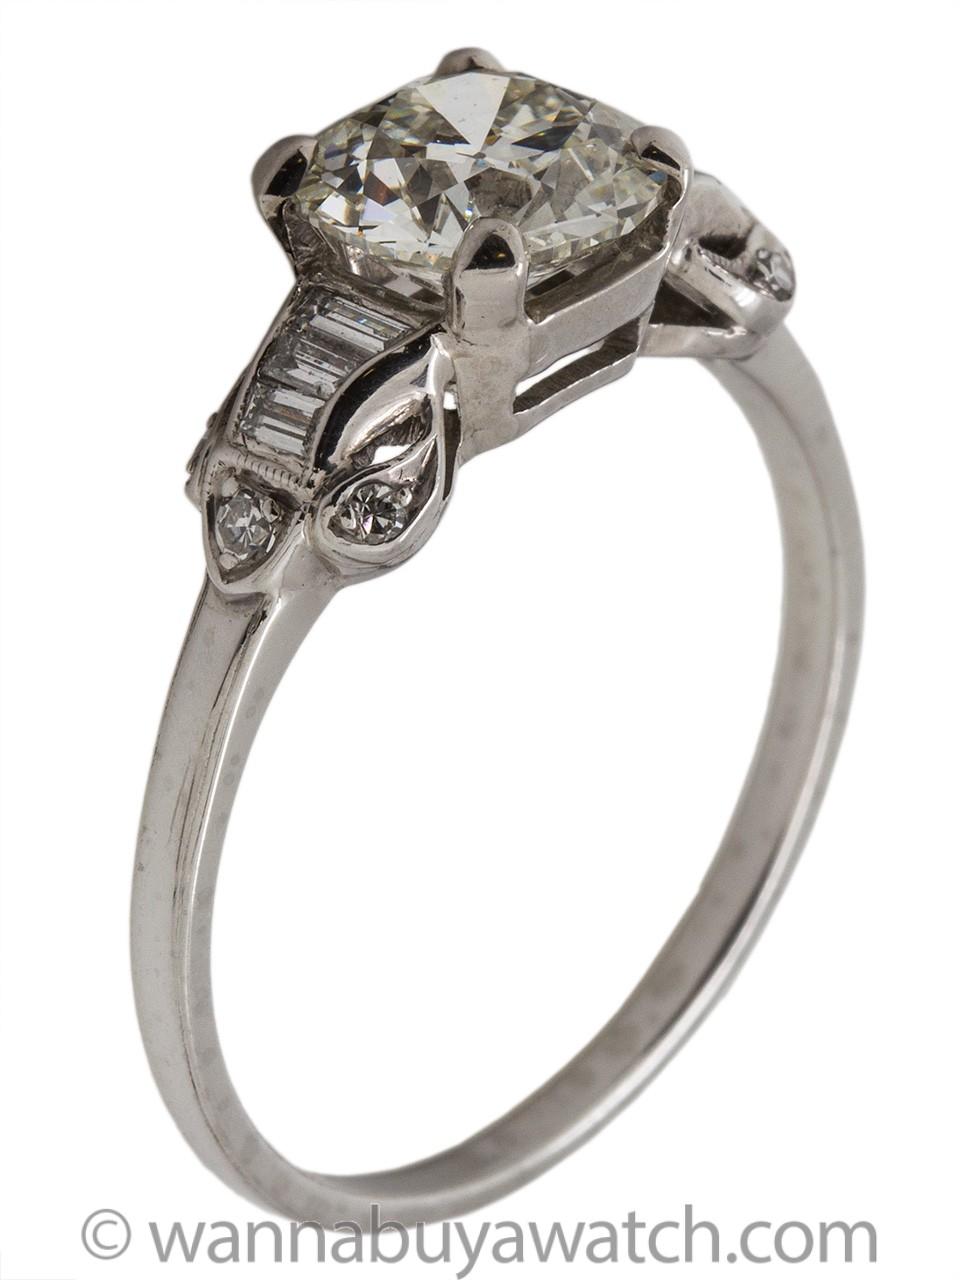 Vintage Engagement Ring Platinum 1.61ct Old European Cut H-VS1 circa 1940s